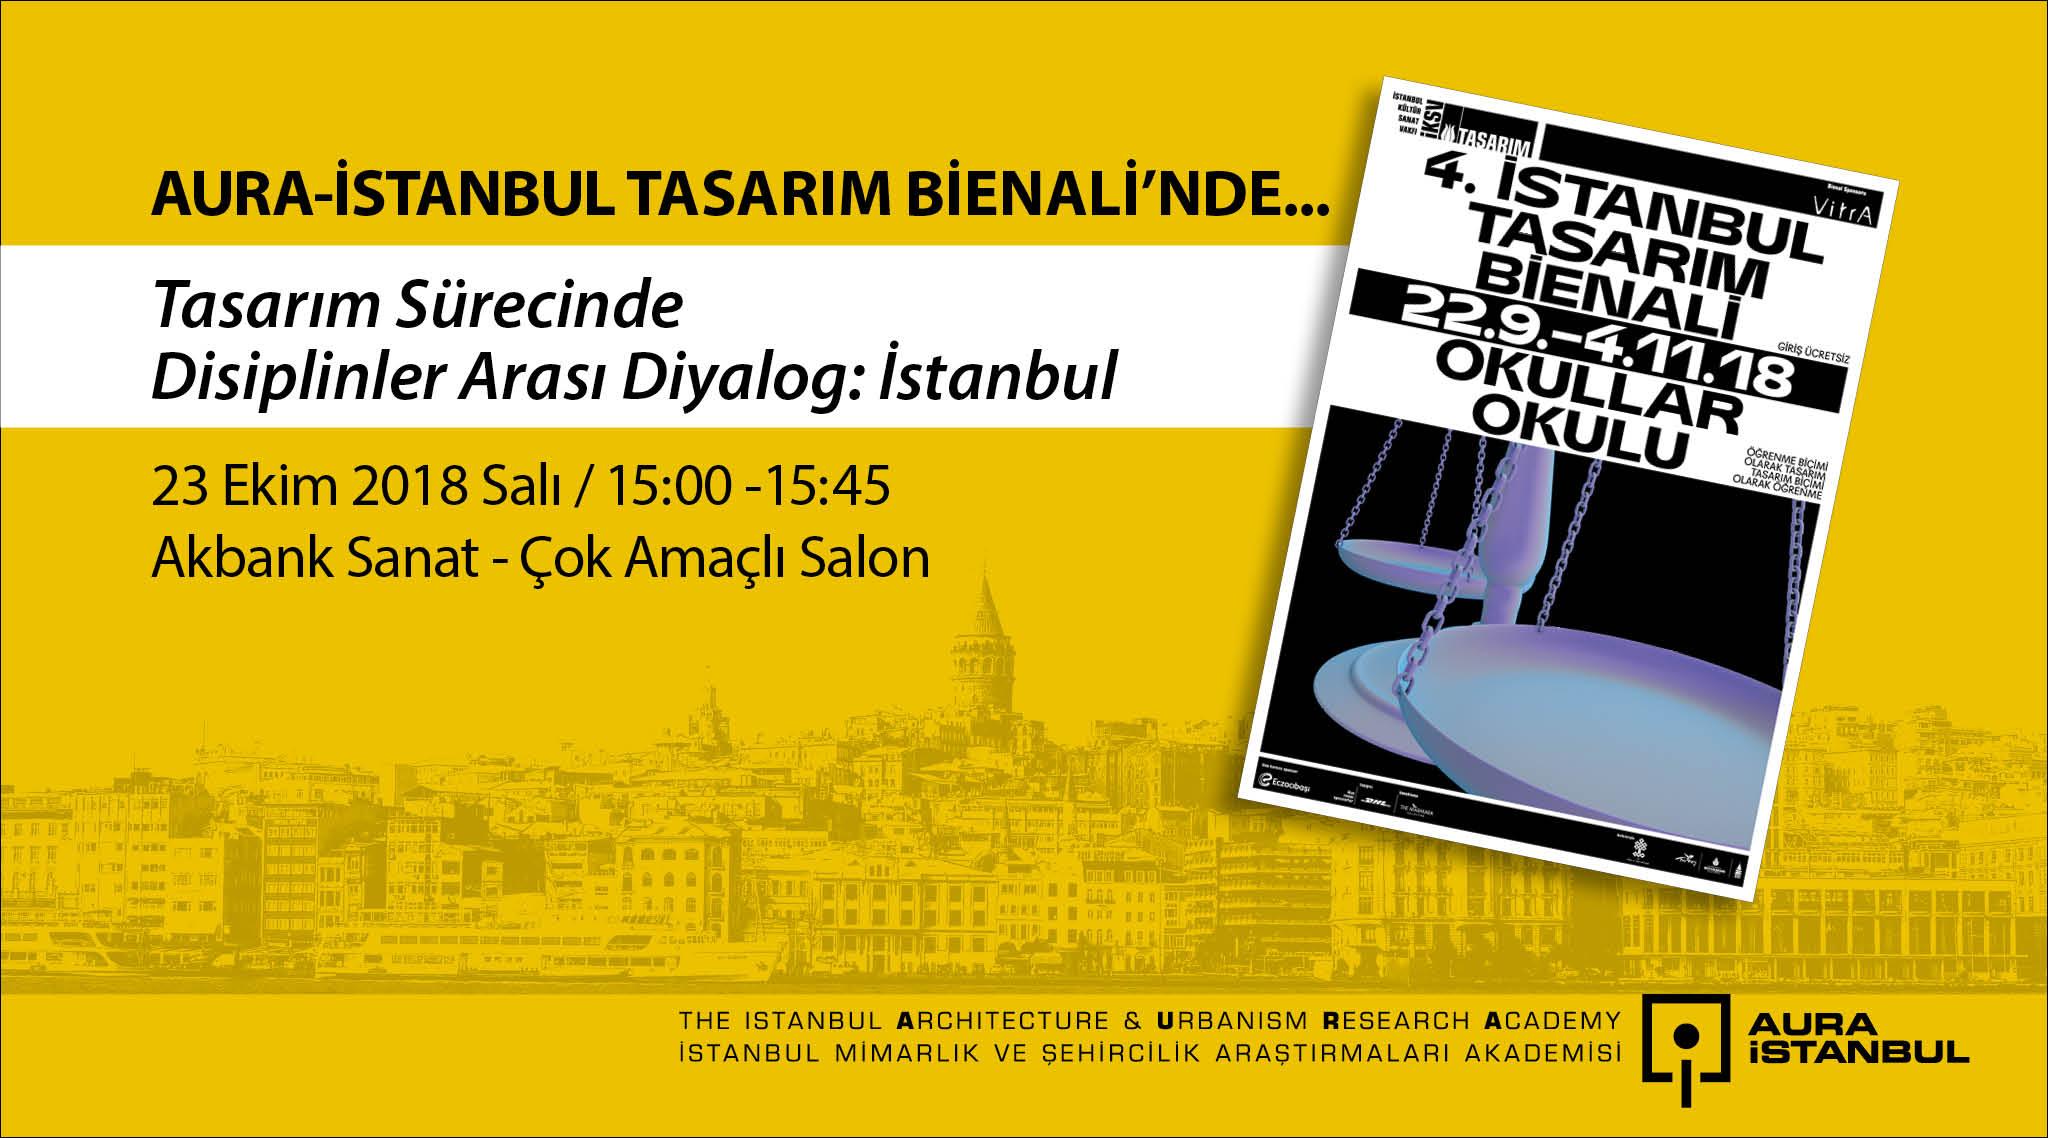 AURA-İstanbul Tasarım Bienali'nde…